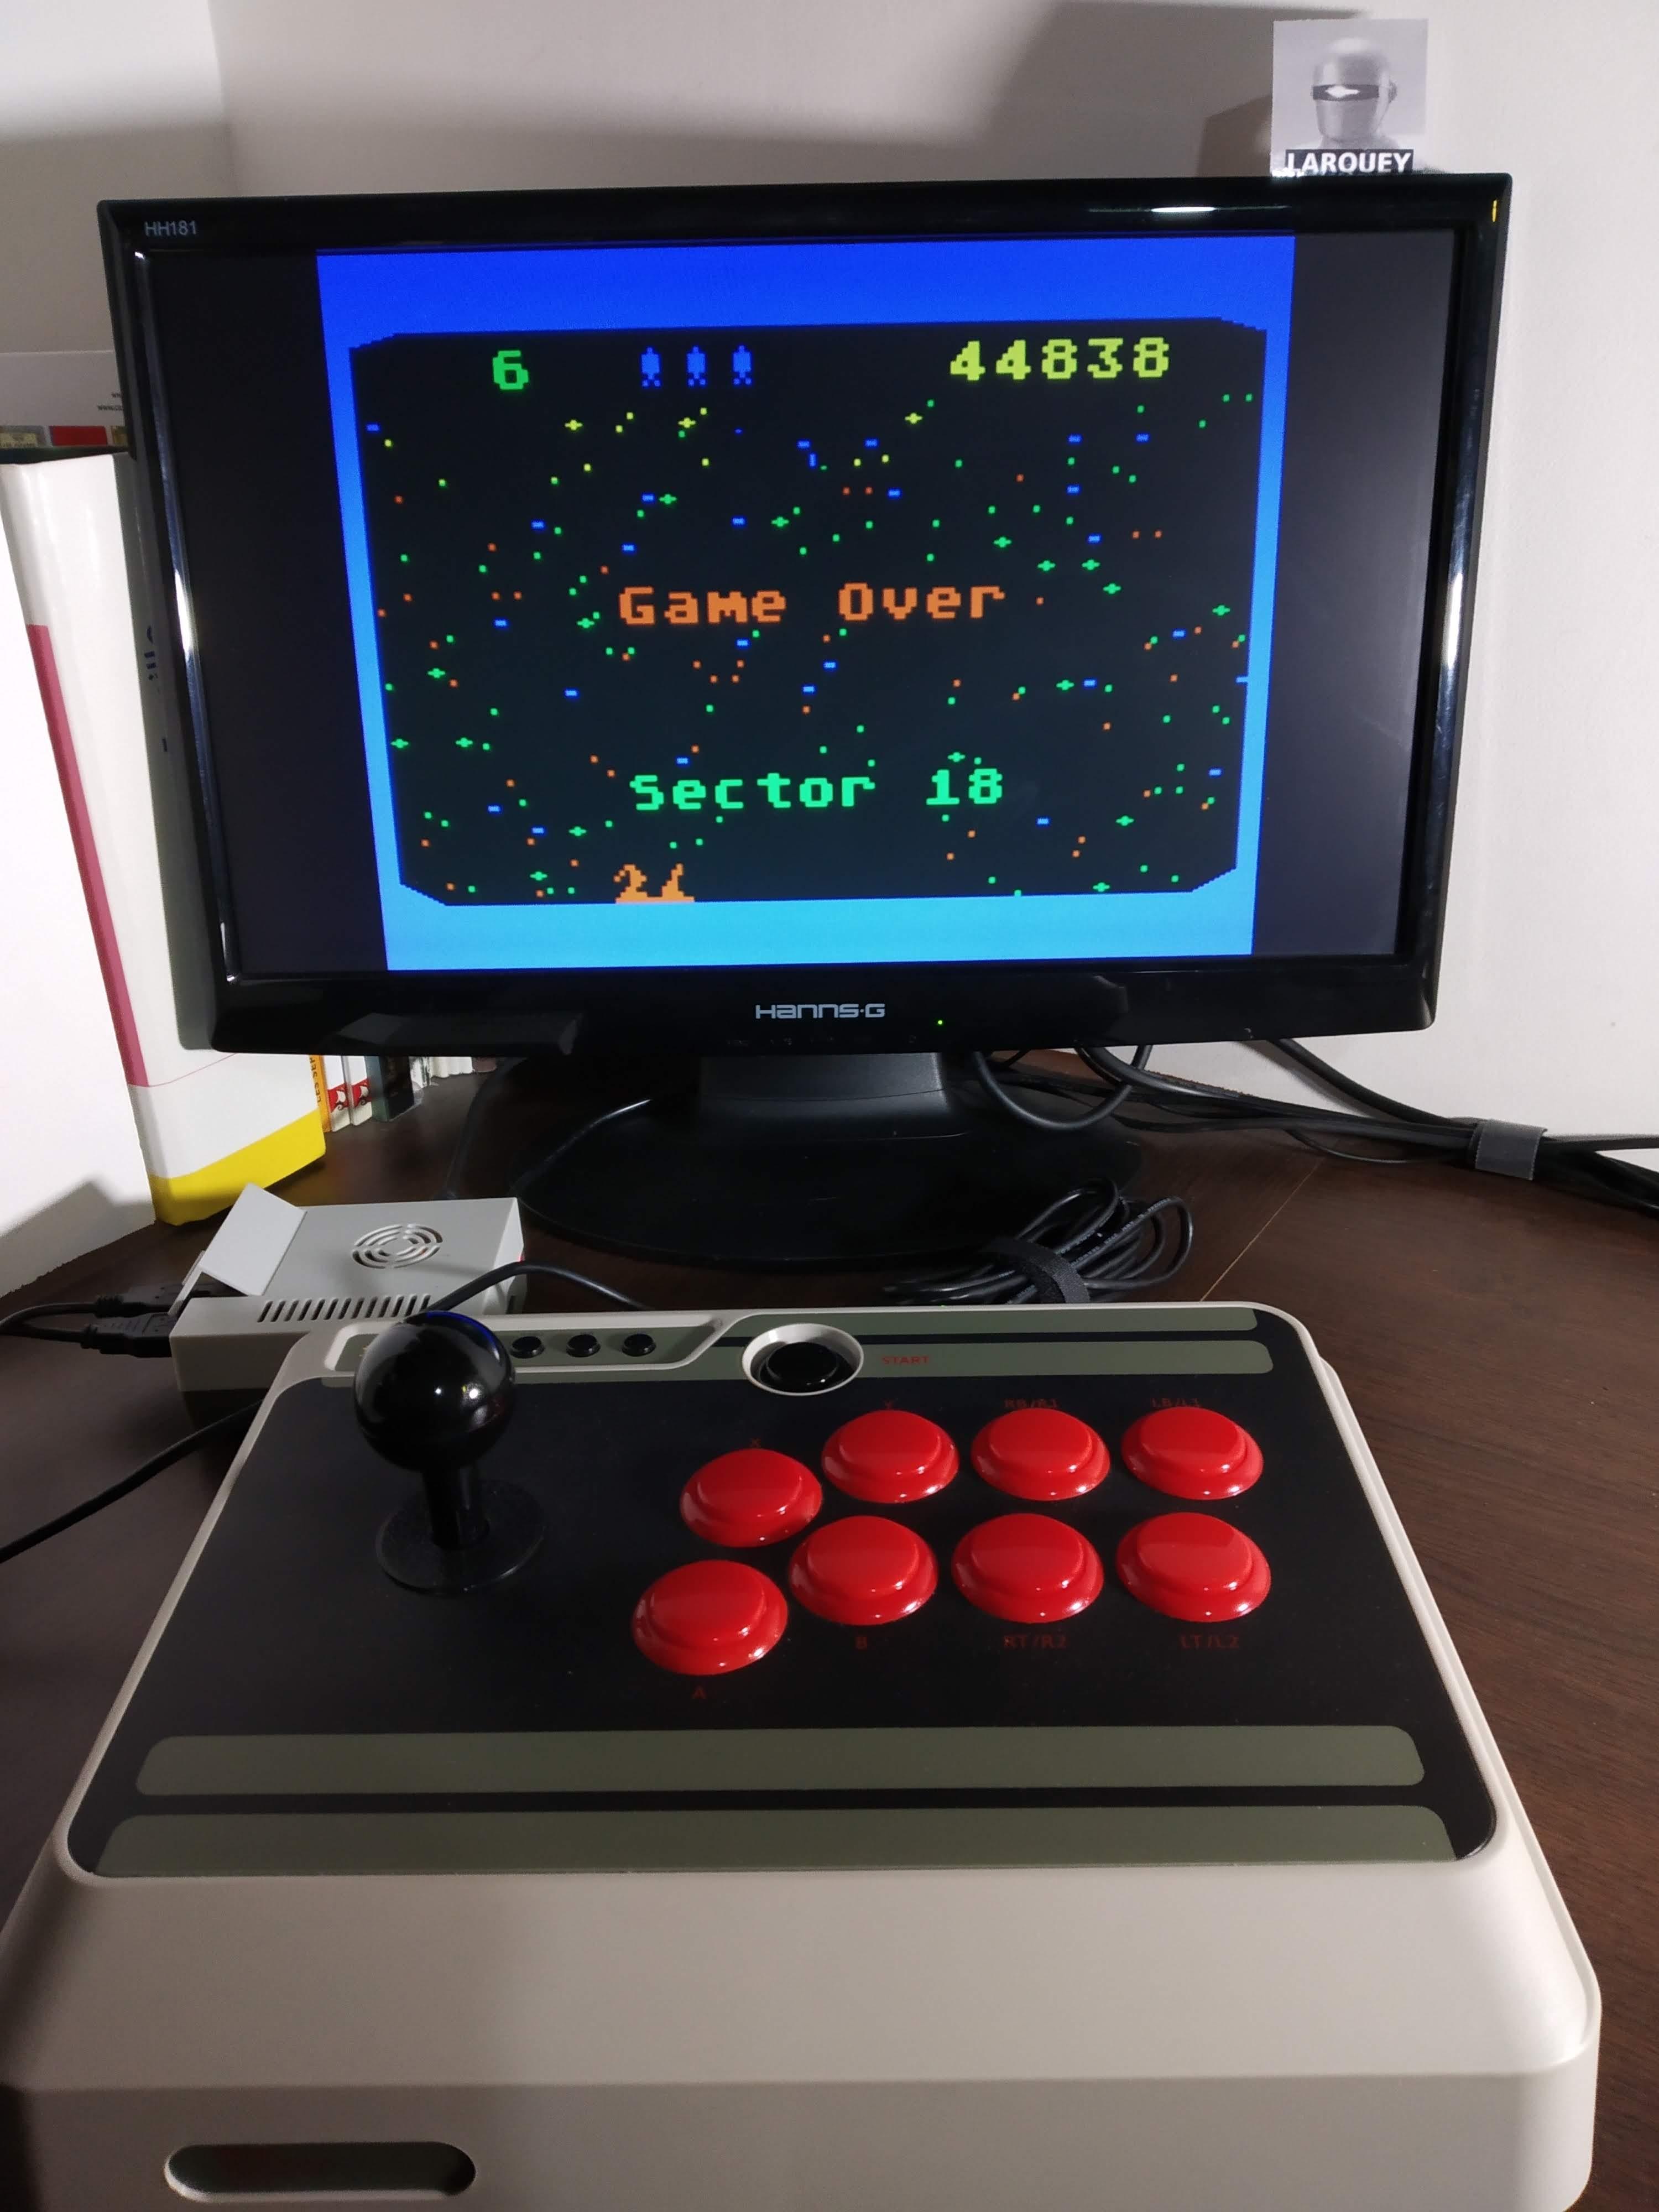 Larquey: Beamrider (Atari 400/800/XL/XE Emulated) 44,838 points on 2019-12-01 05:14:37